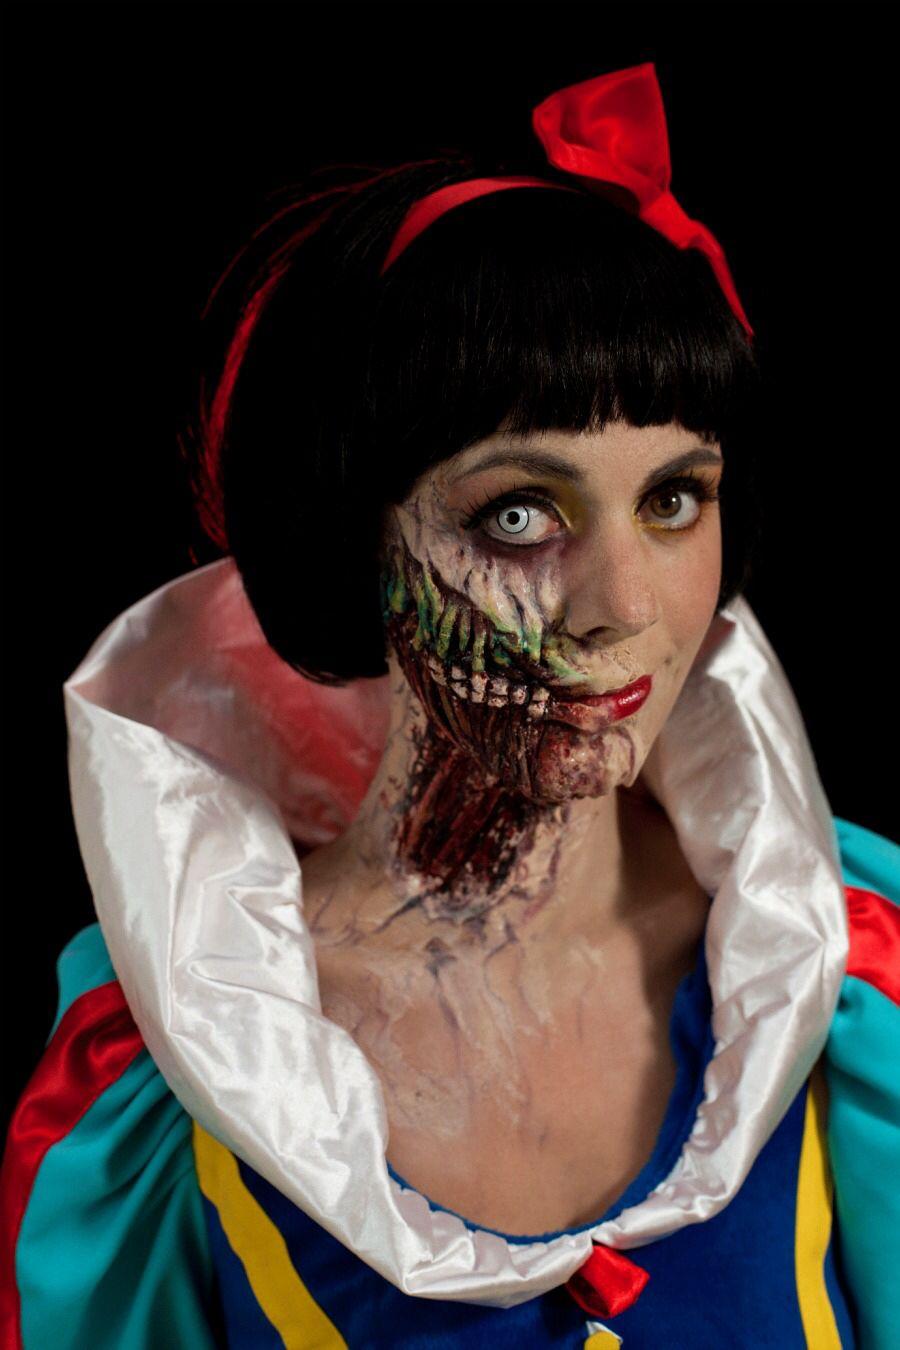 Halloween Snow white | Halloween party costumes, Original ...  Original Snow White Costume